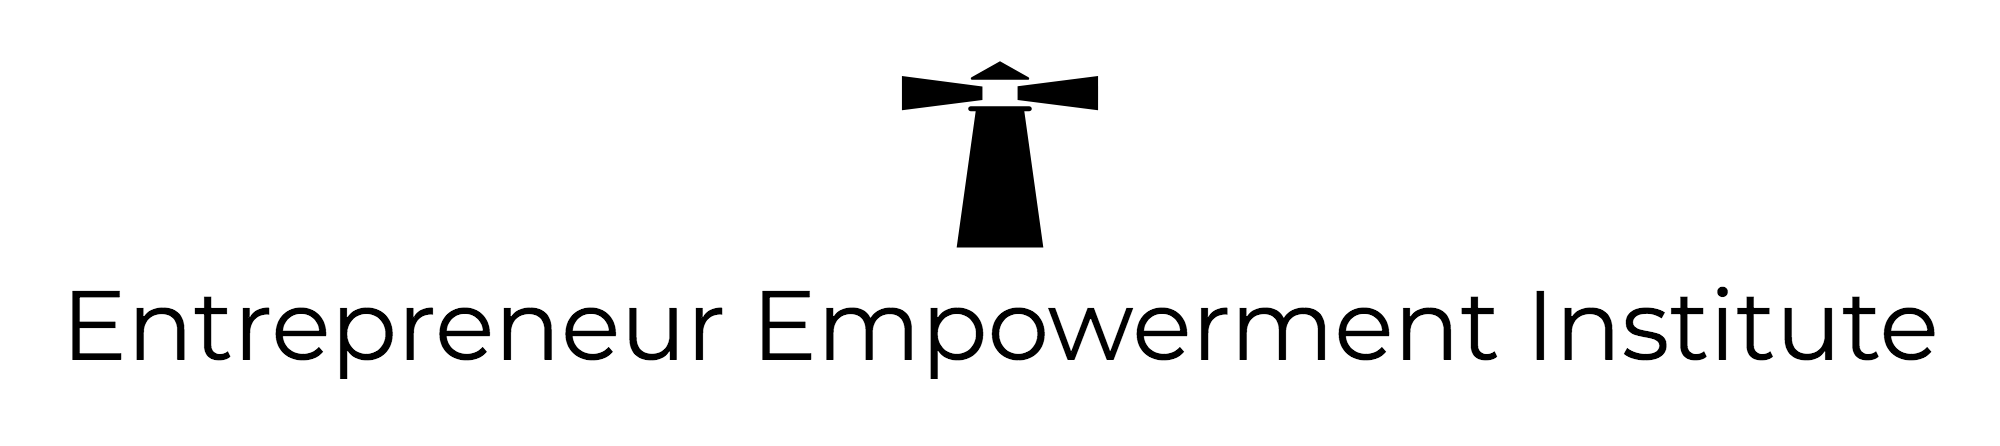 Entrepreneur Empowerment Institute-logo-black (1).png